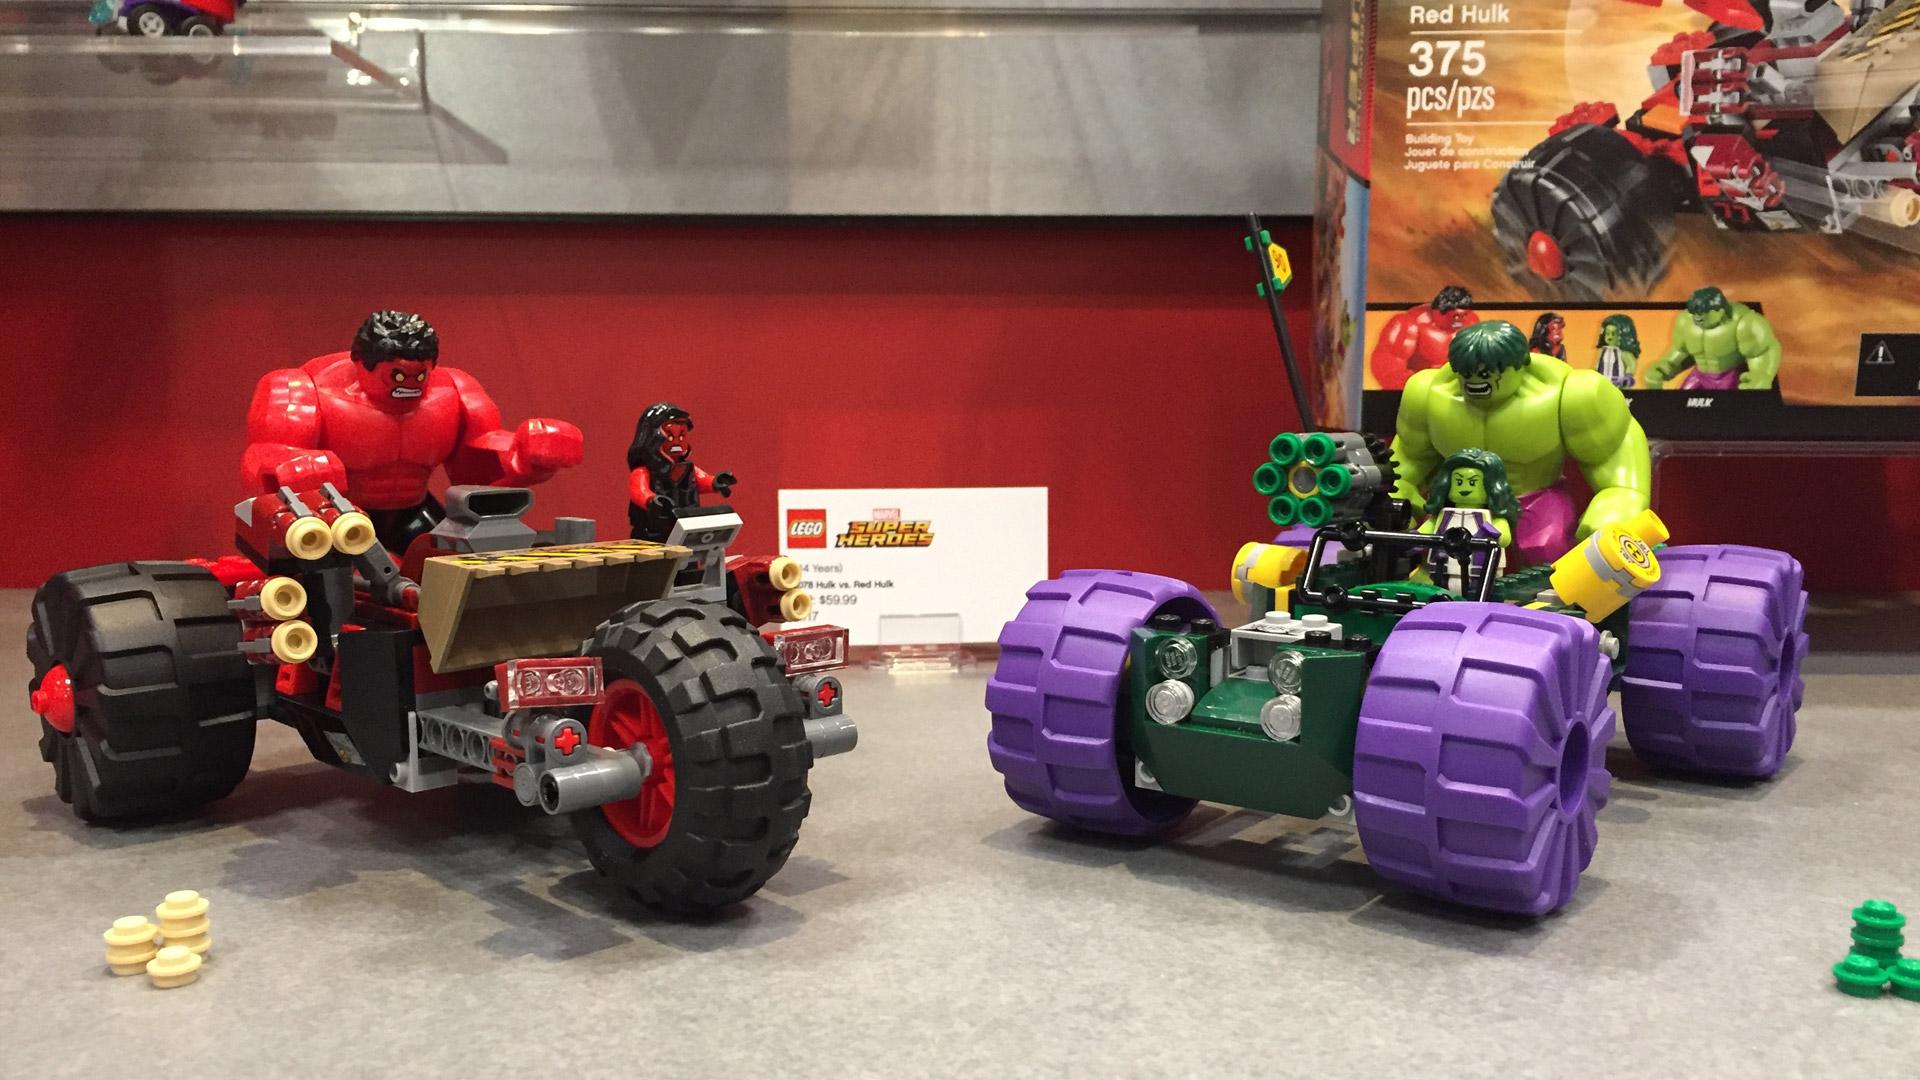 LEGO Marvel Super Heroes Set 76078 Hulk vs Red Hulk at Toy Fair 2017